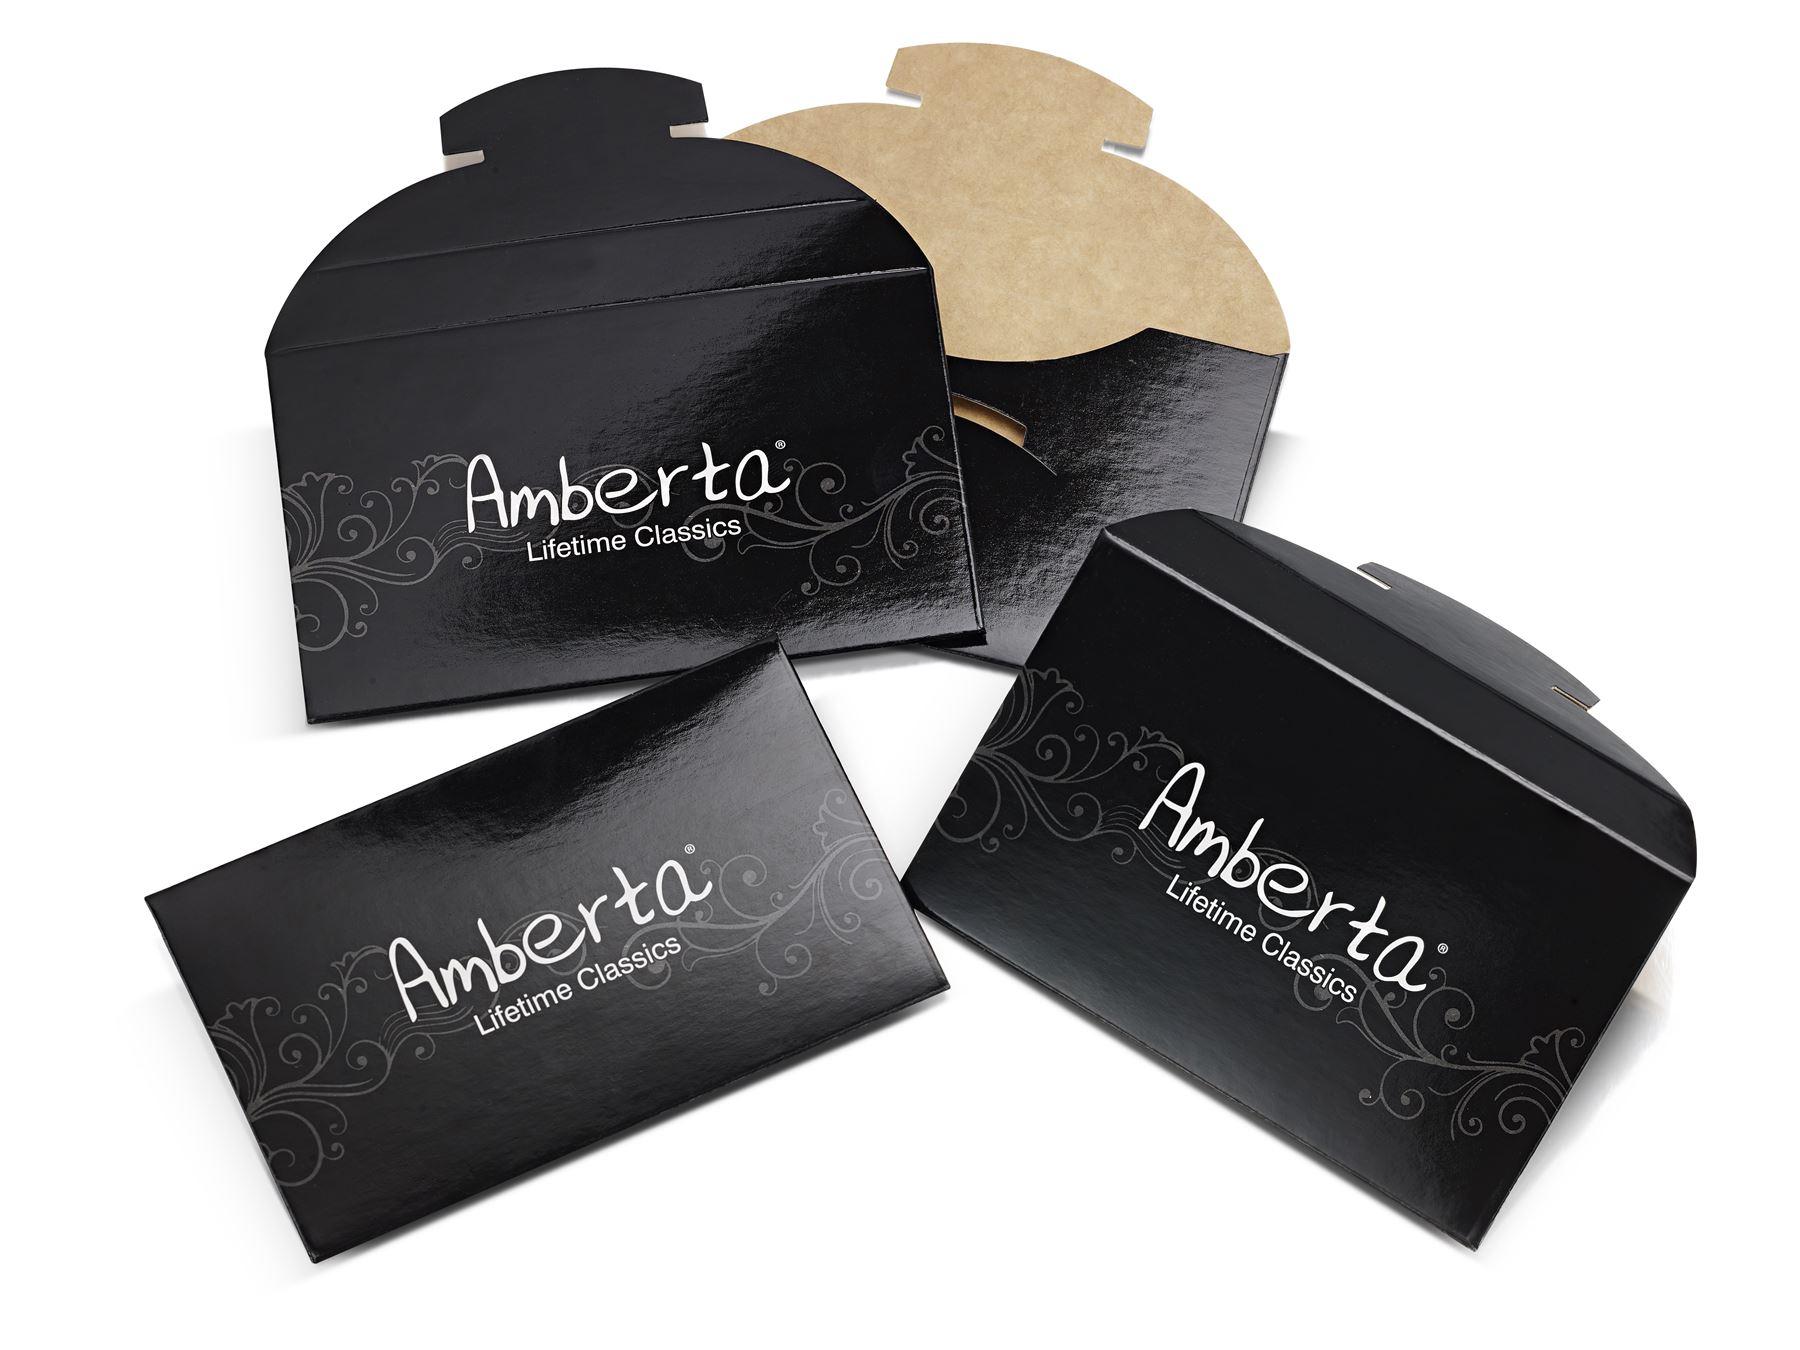 Amberta-Jewelry-925-Sterling-Silver-Adjustable-Anklet-Foot-Bracelet-for-Women miniature 55